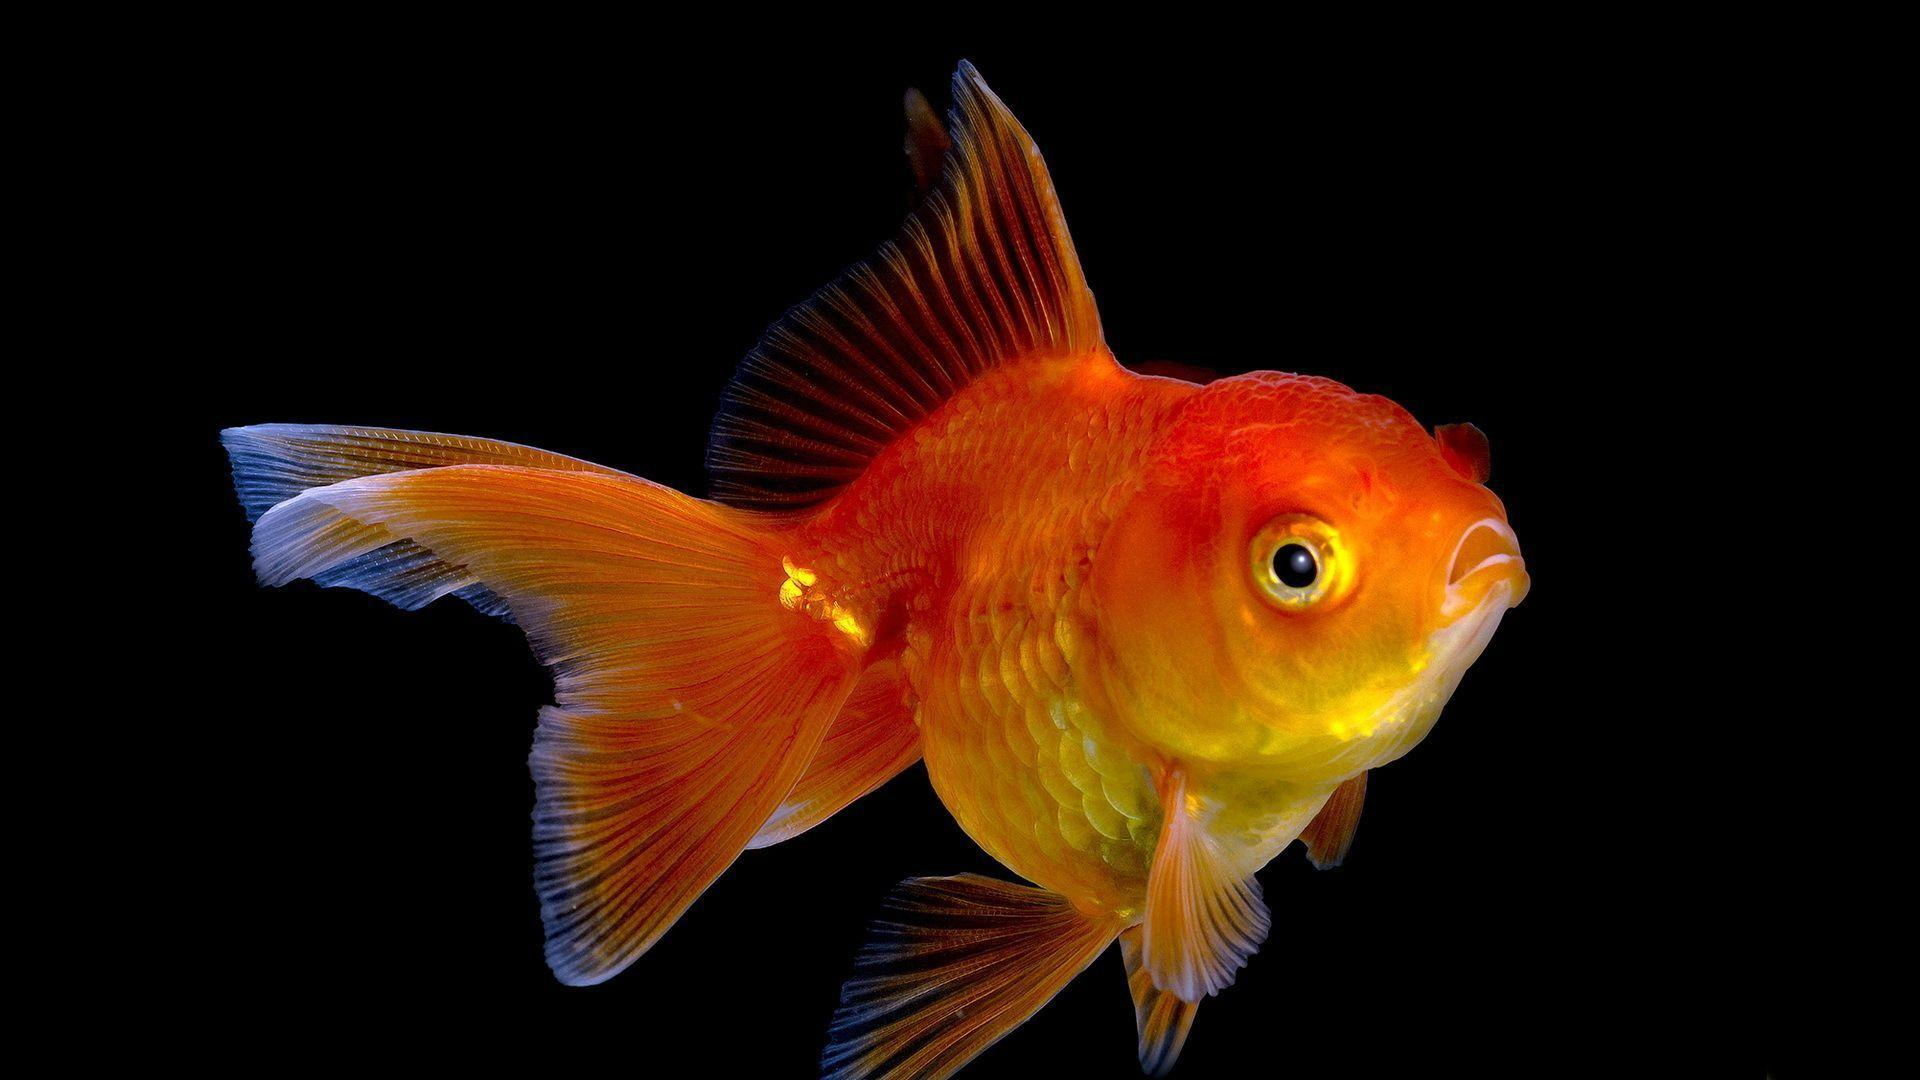 Fish Wallpapers - Wallpaper Cave